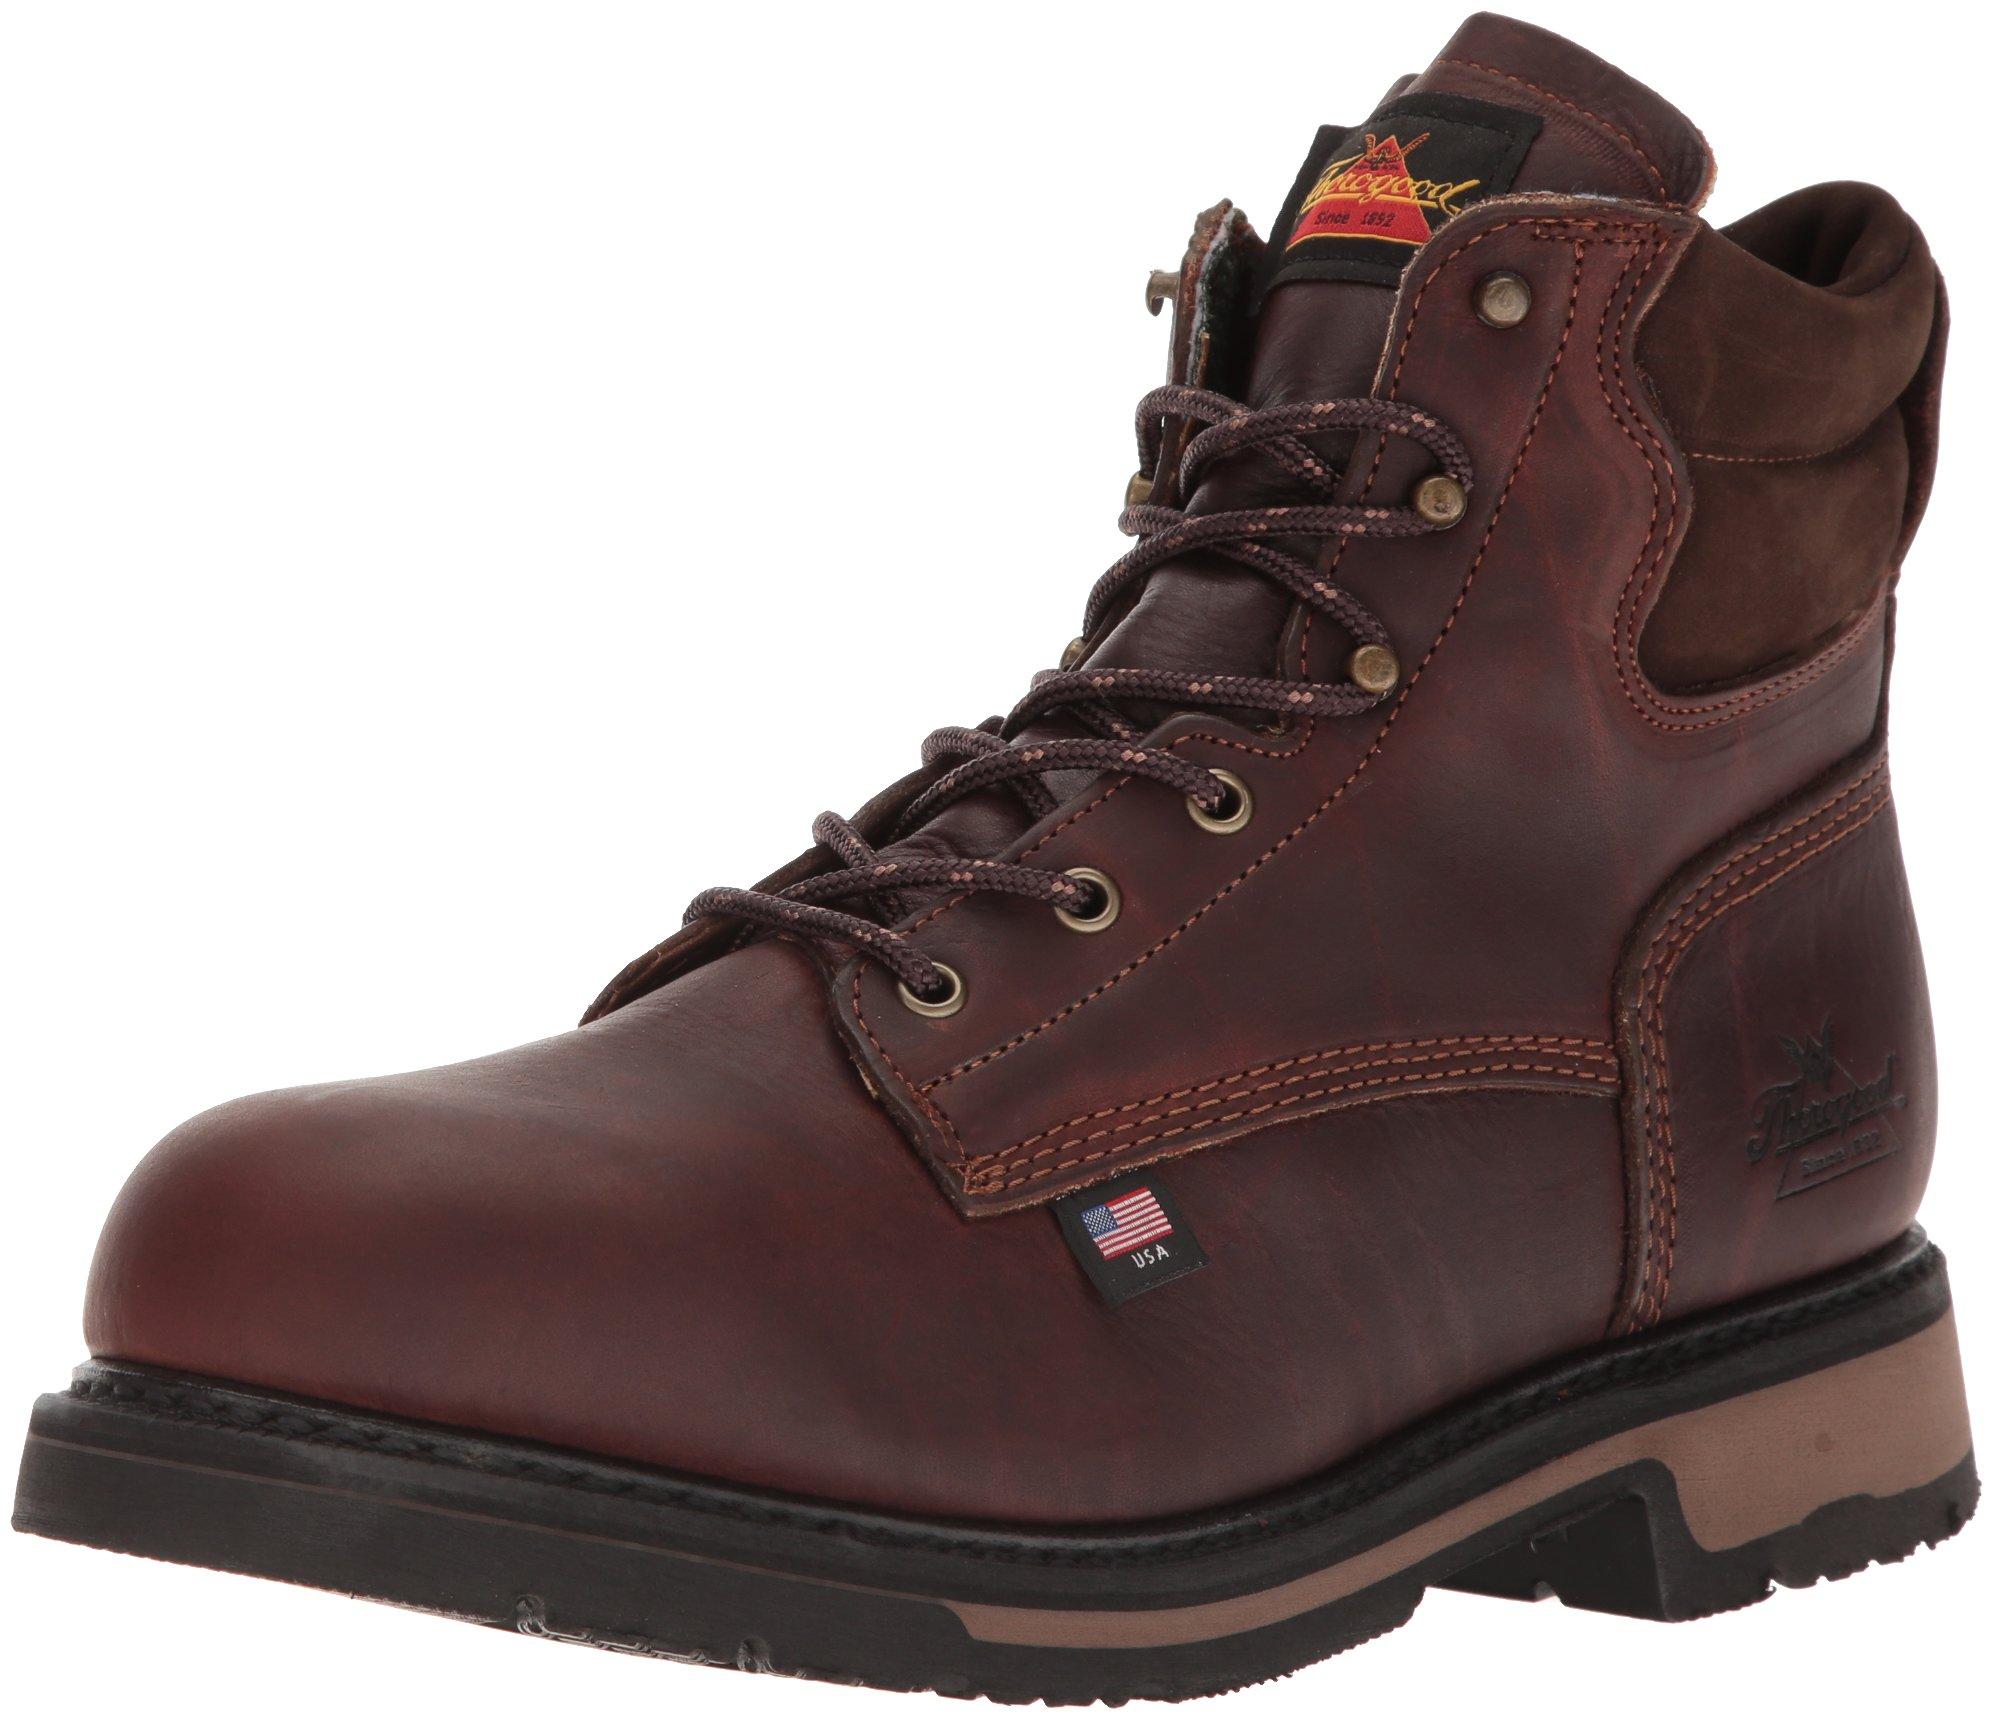 5aadb157e32 Thorogood 804-4203 Men's American Heritage 6 Classic Plain Toe ...